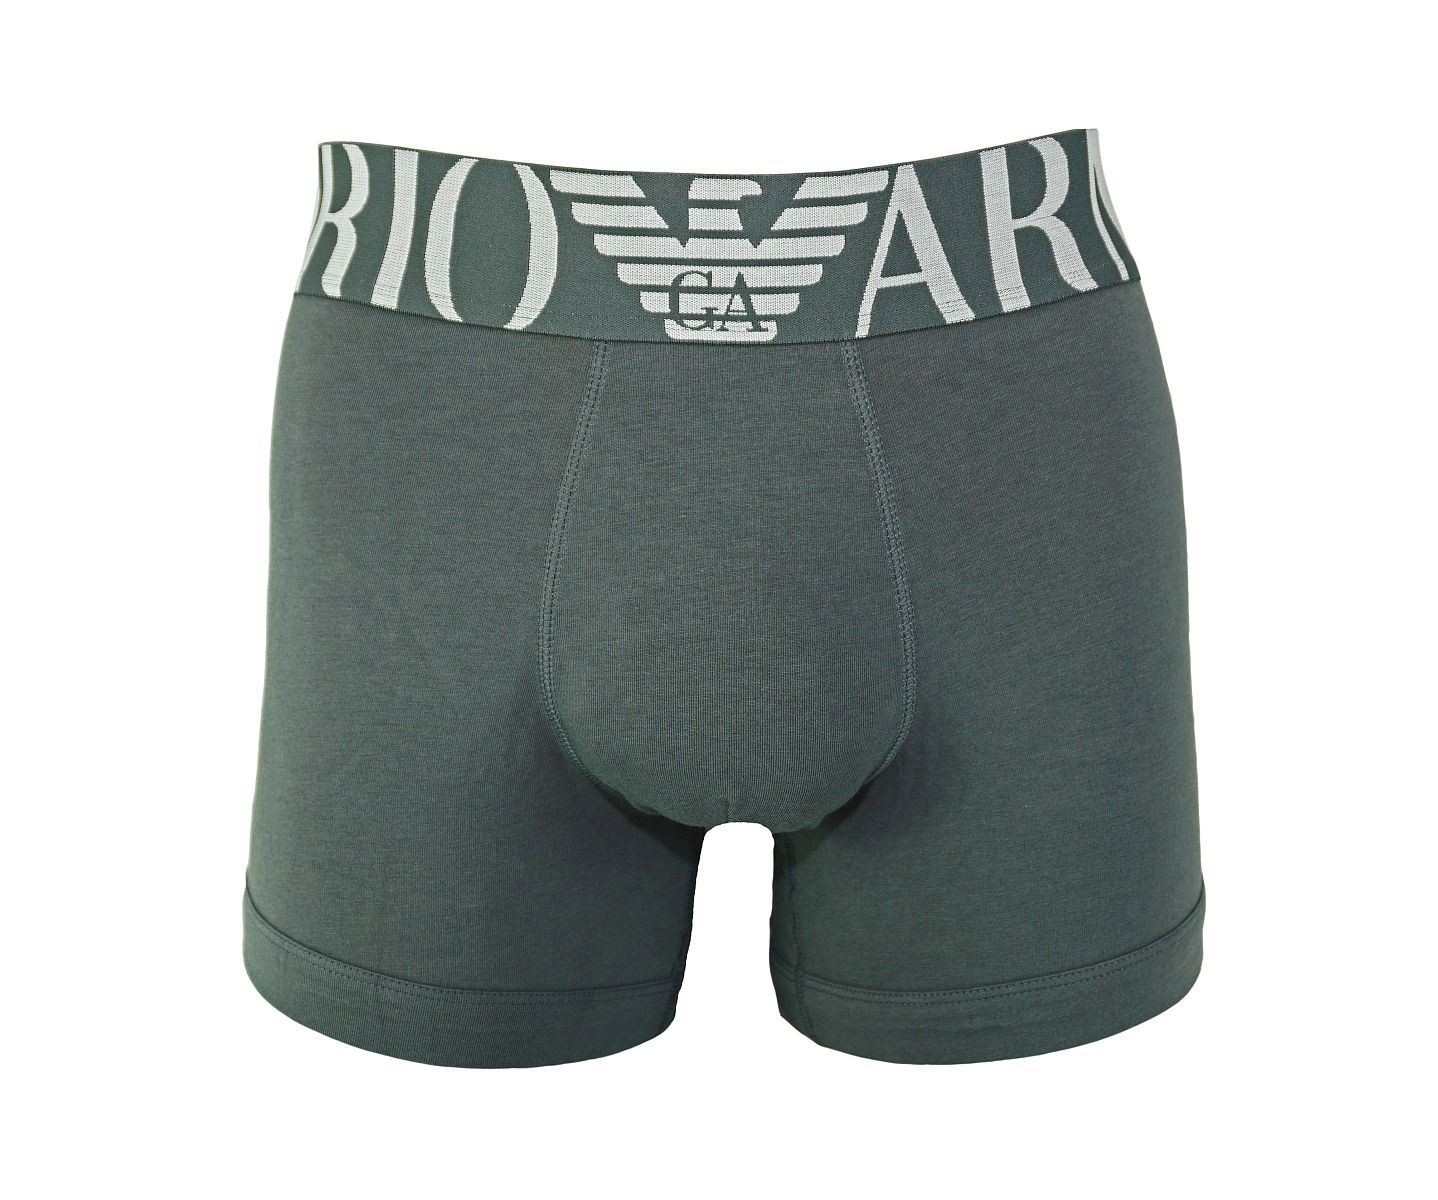 Emporio Armani Shorts Boxer Unterhose 110818 8P516 00044 ANTRACITE W18-EABX1